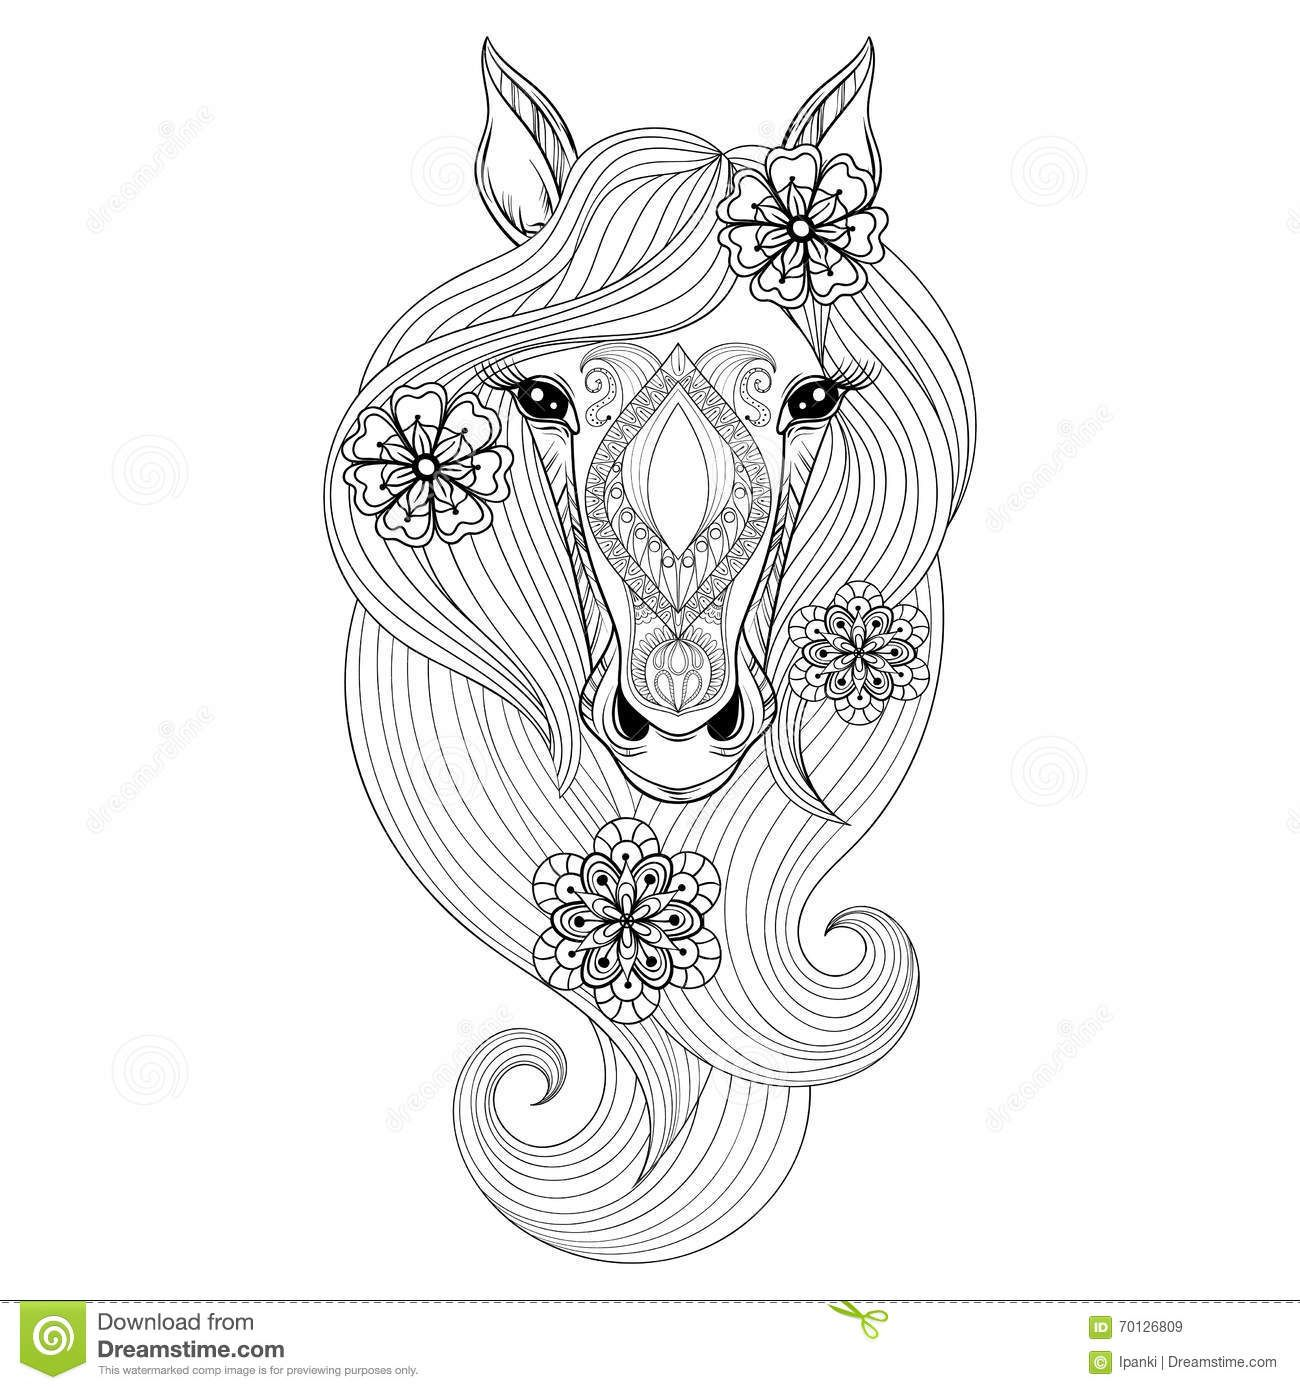 Bildresultat For Mandala Horse Coloring Pages Horse Coloring Pages Horse Tattoo Horse Coloring